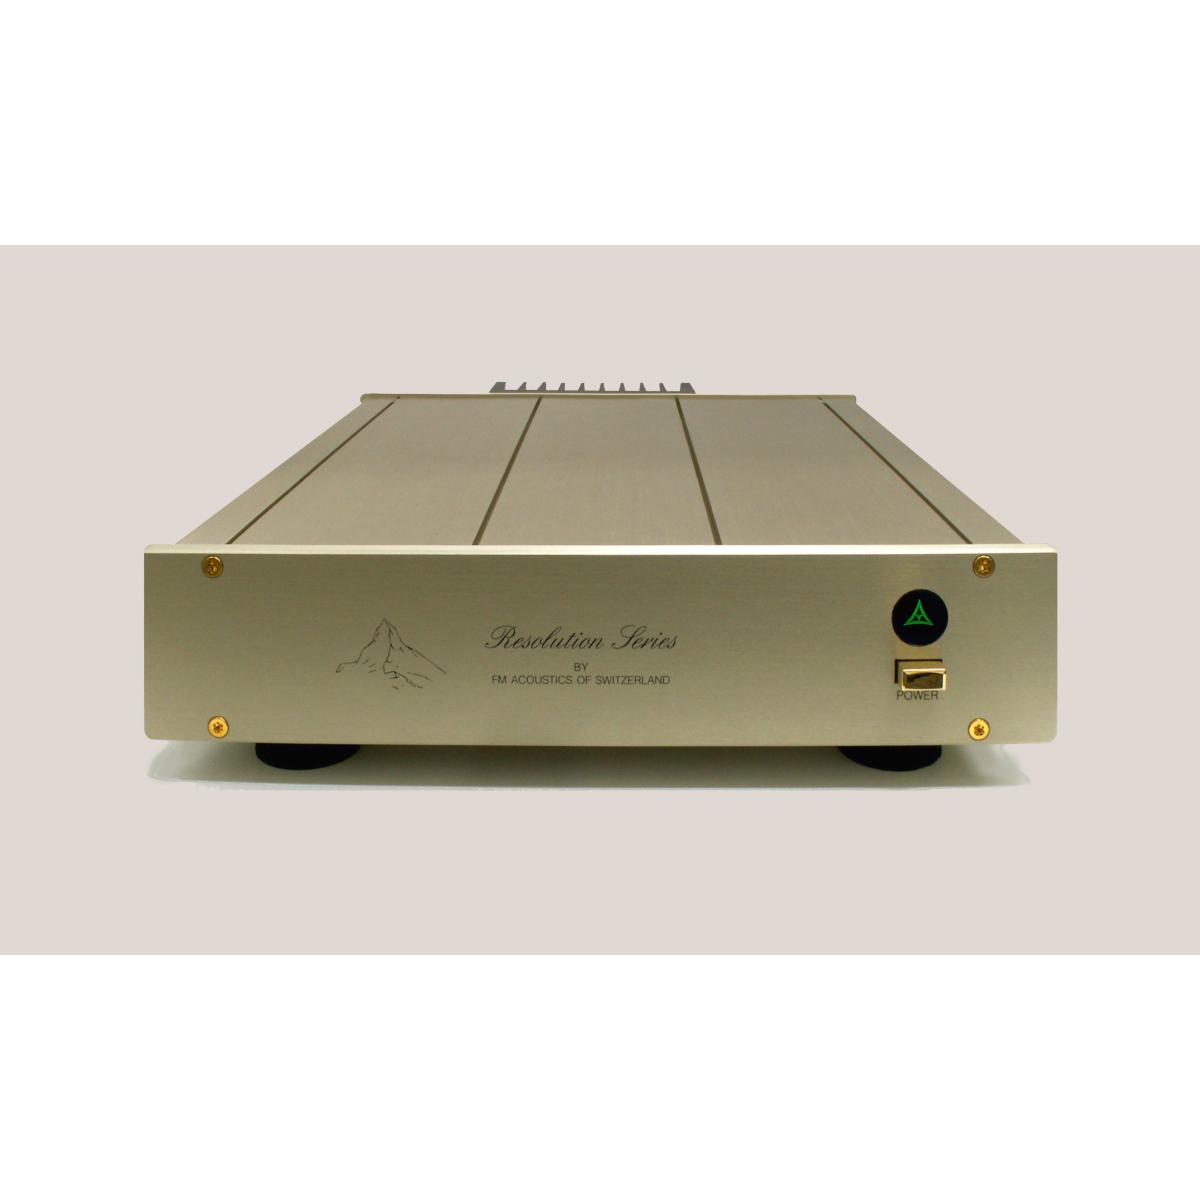 FM Acoustics FM108-MkII FMアコースティックス Power Amplifier ペア 完全受注品(キャンセル不可) 特別価格ASK!